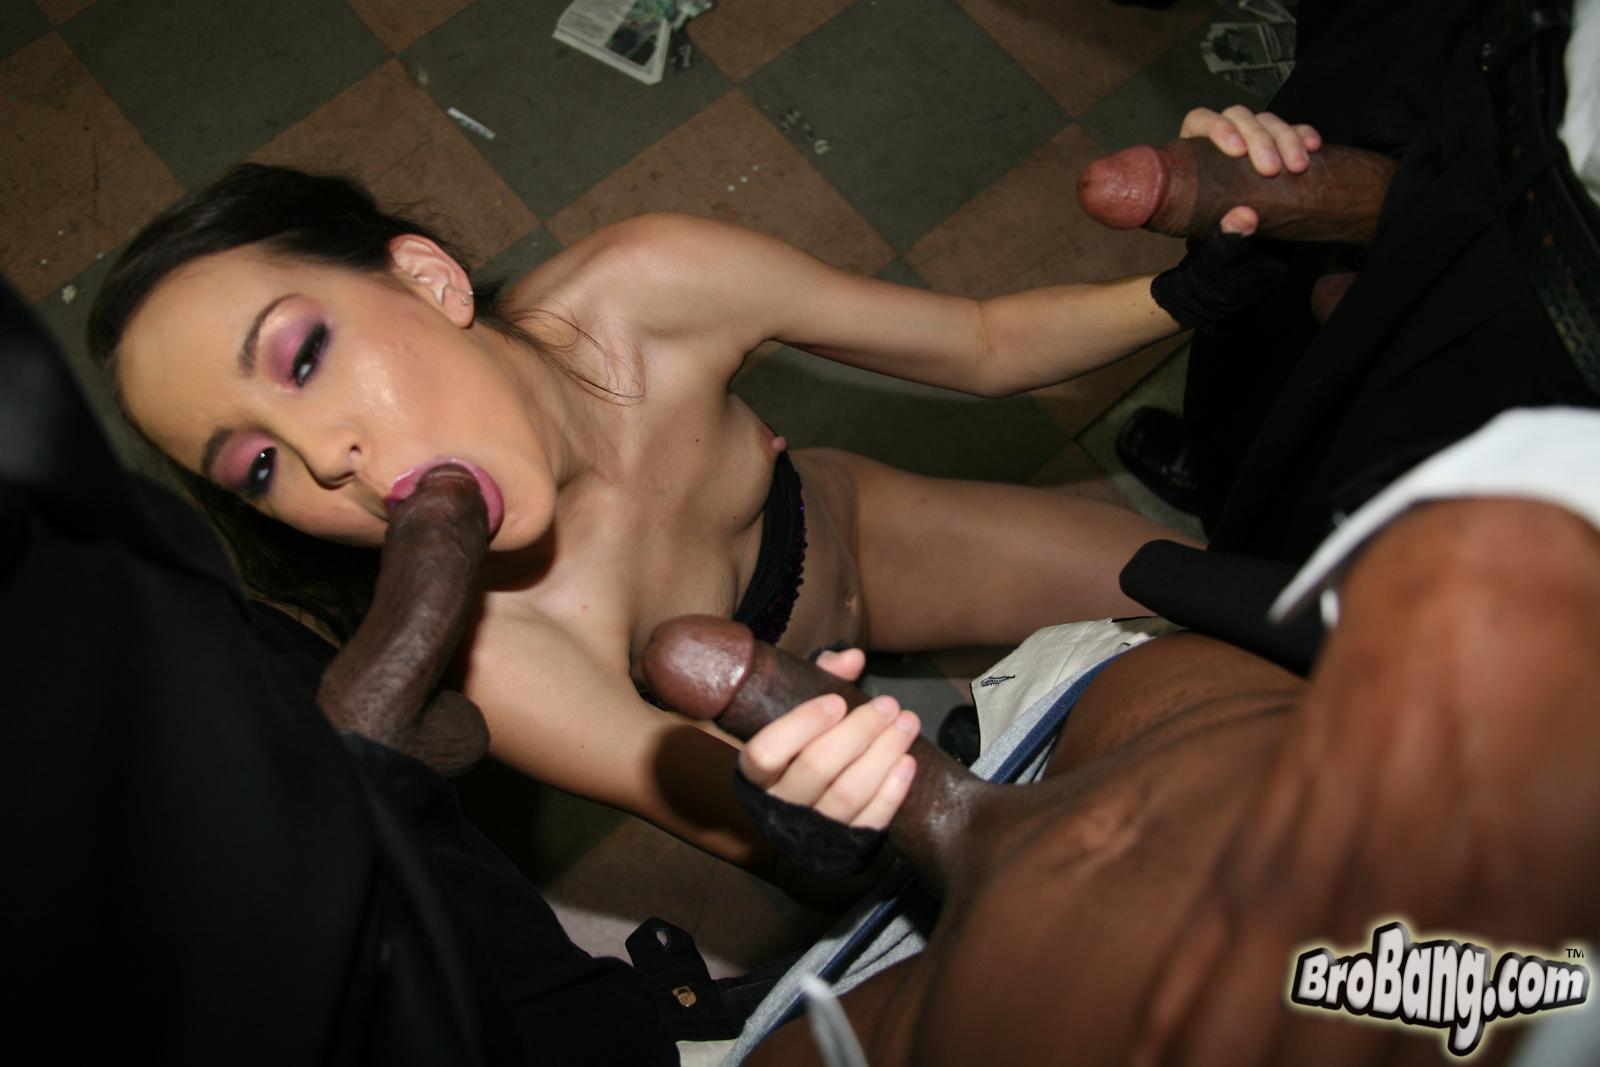 Секс с амаи лиу 14 фотография